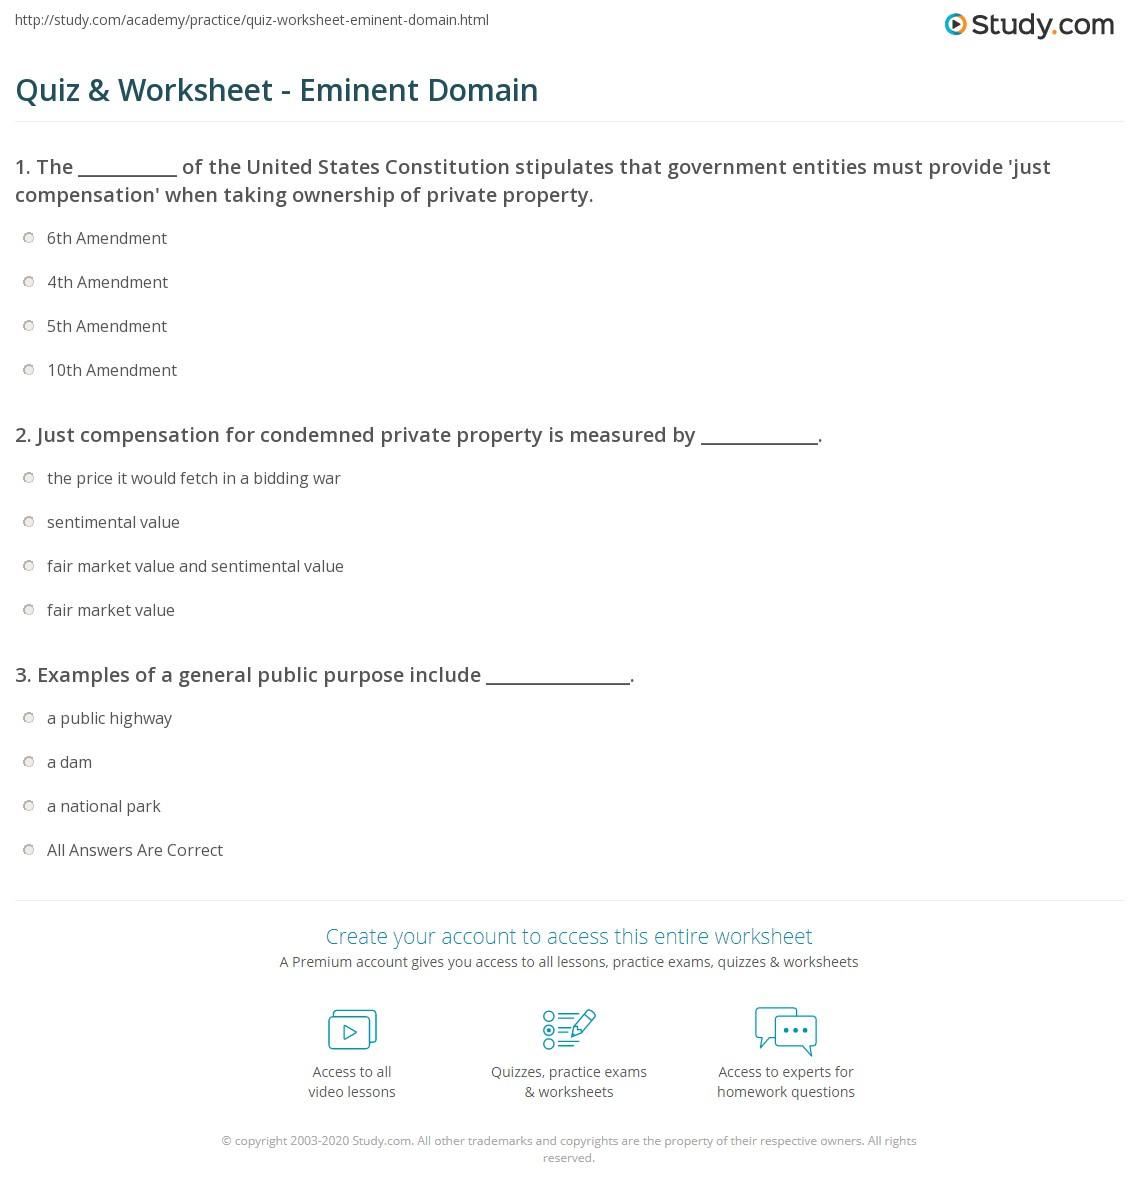 quiz & worksheet - eminent domain | study